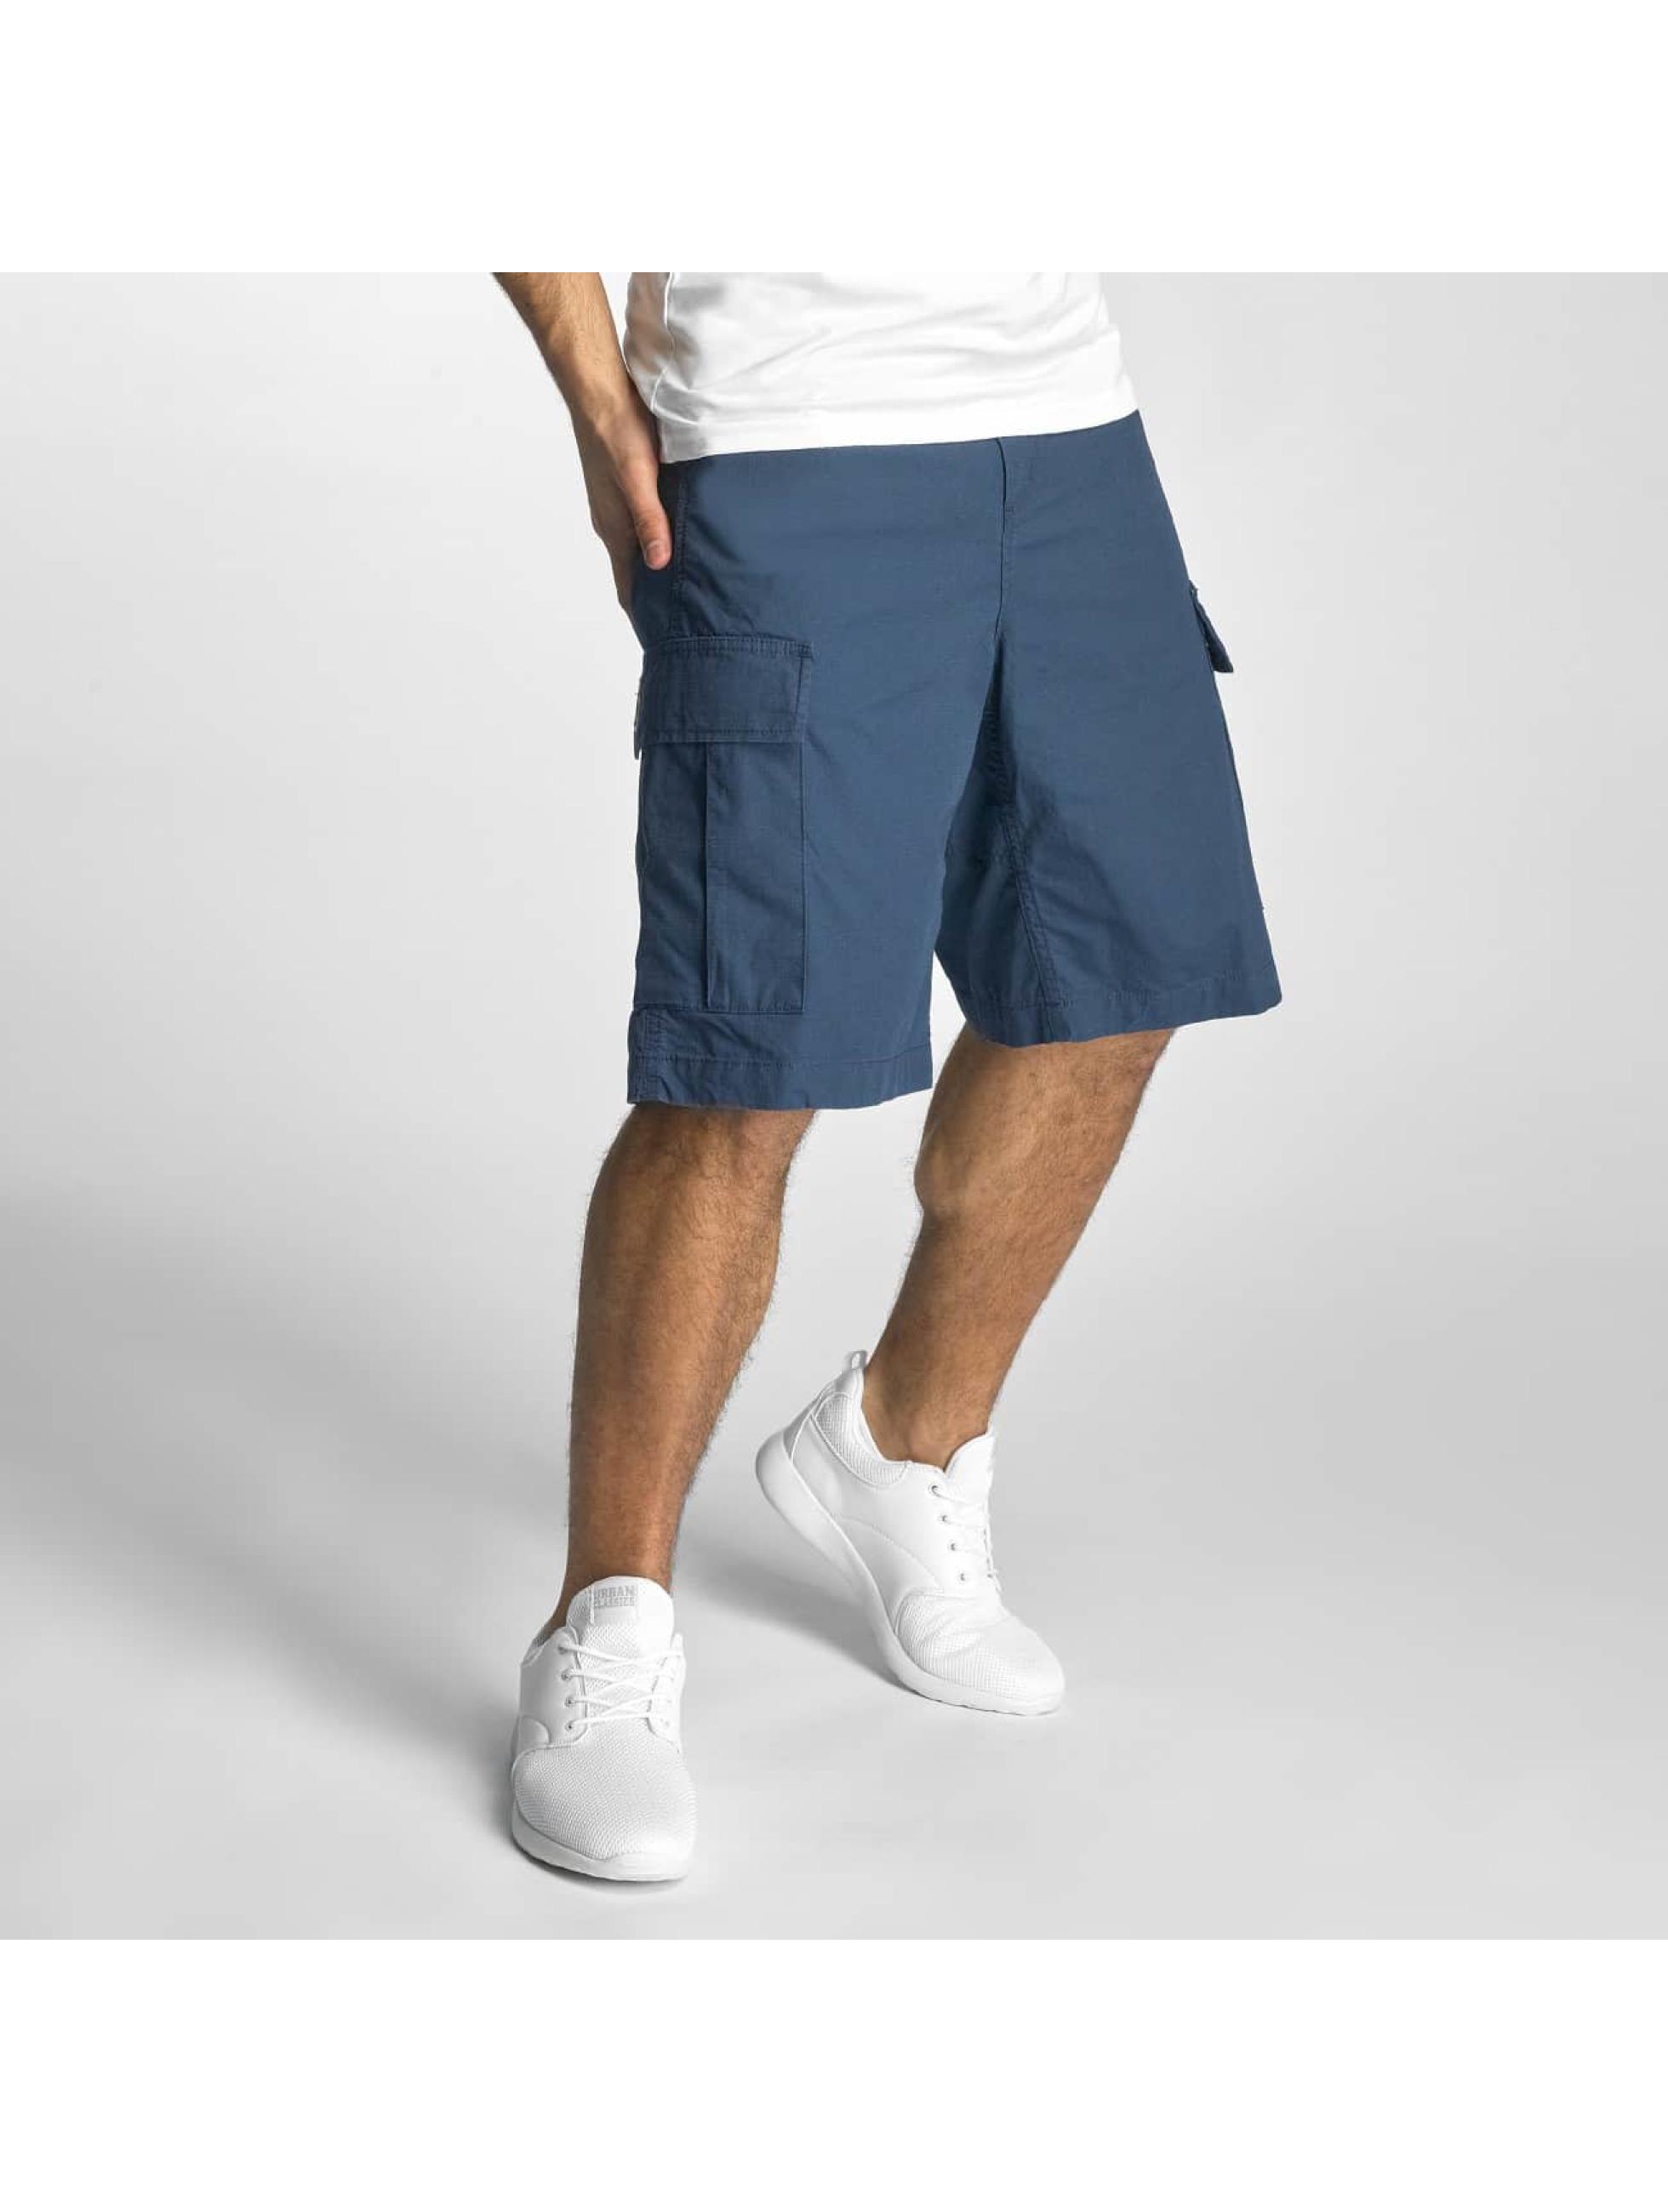 Carhartt WIP Männer Shorts Cargo in blau